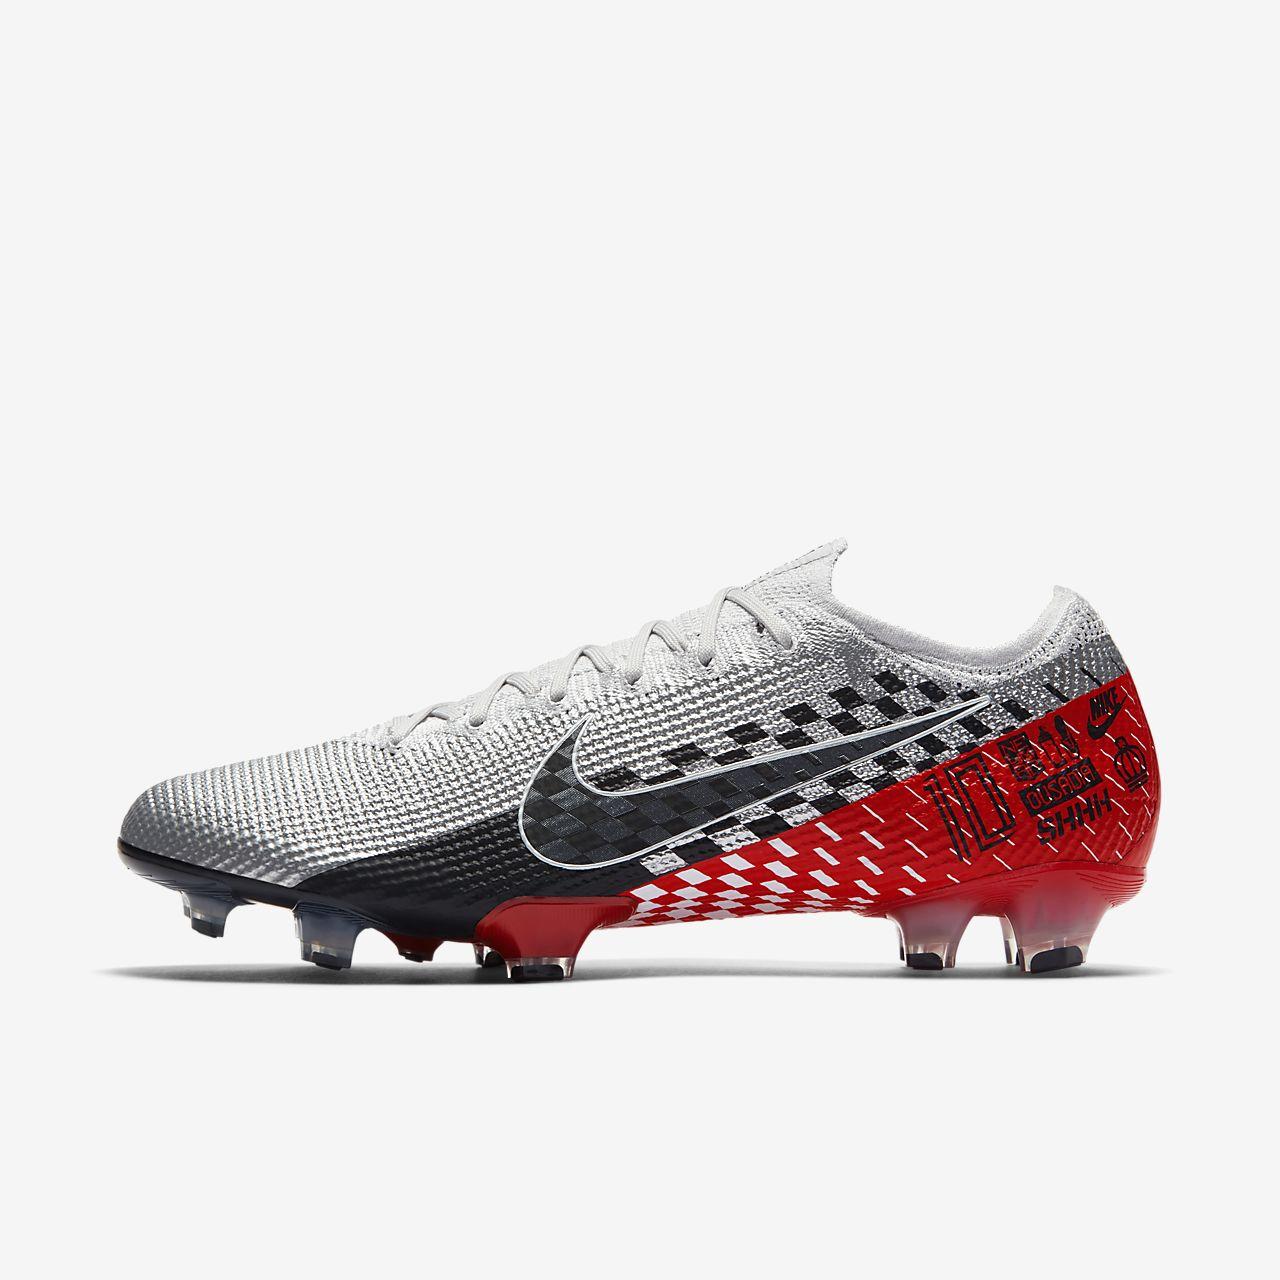 Nike Mercurial Vapor 13 Elite Neymar Jr. FG Voetbalschoen (stevige ondergrond)